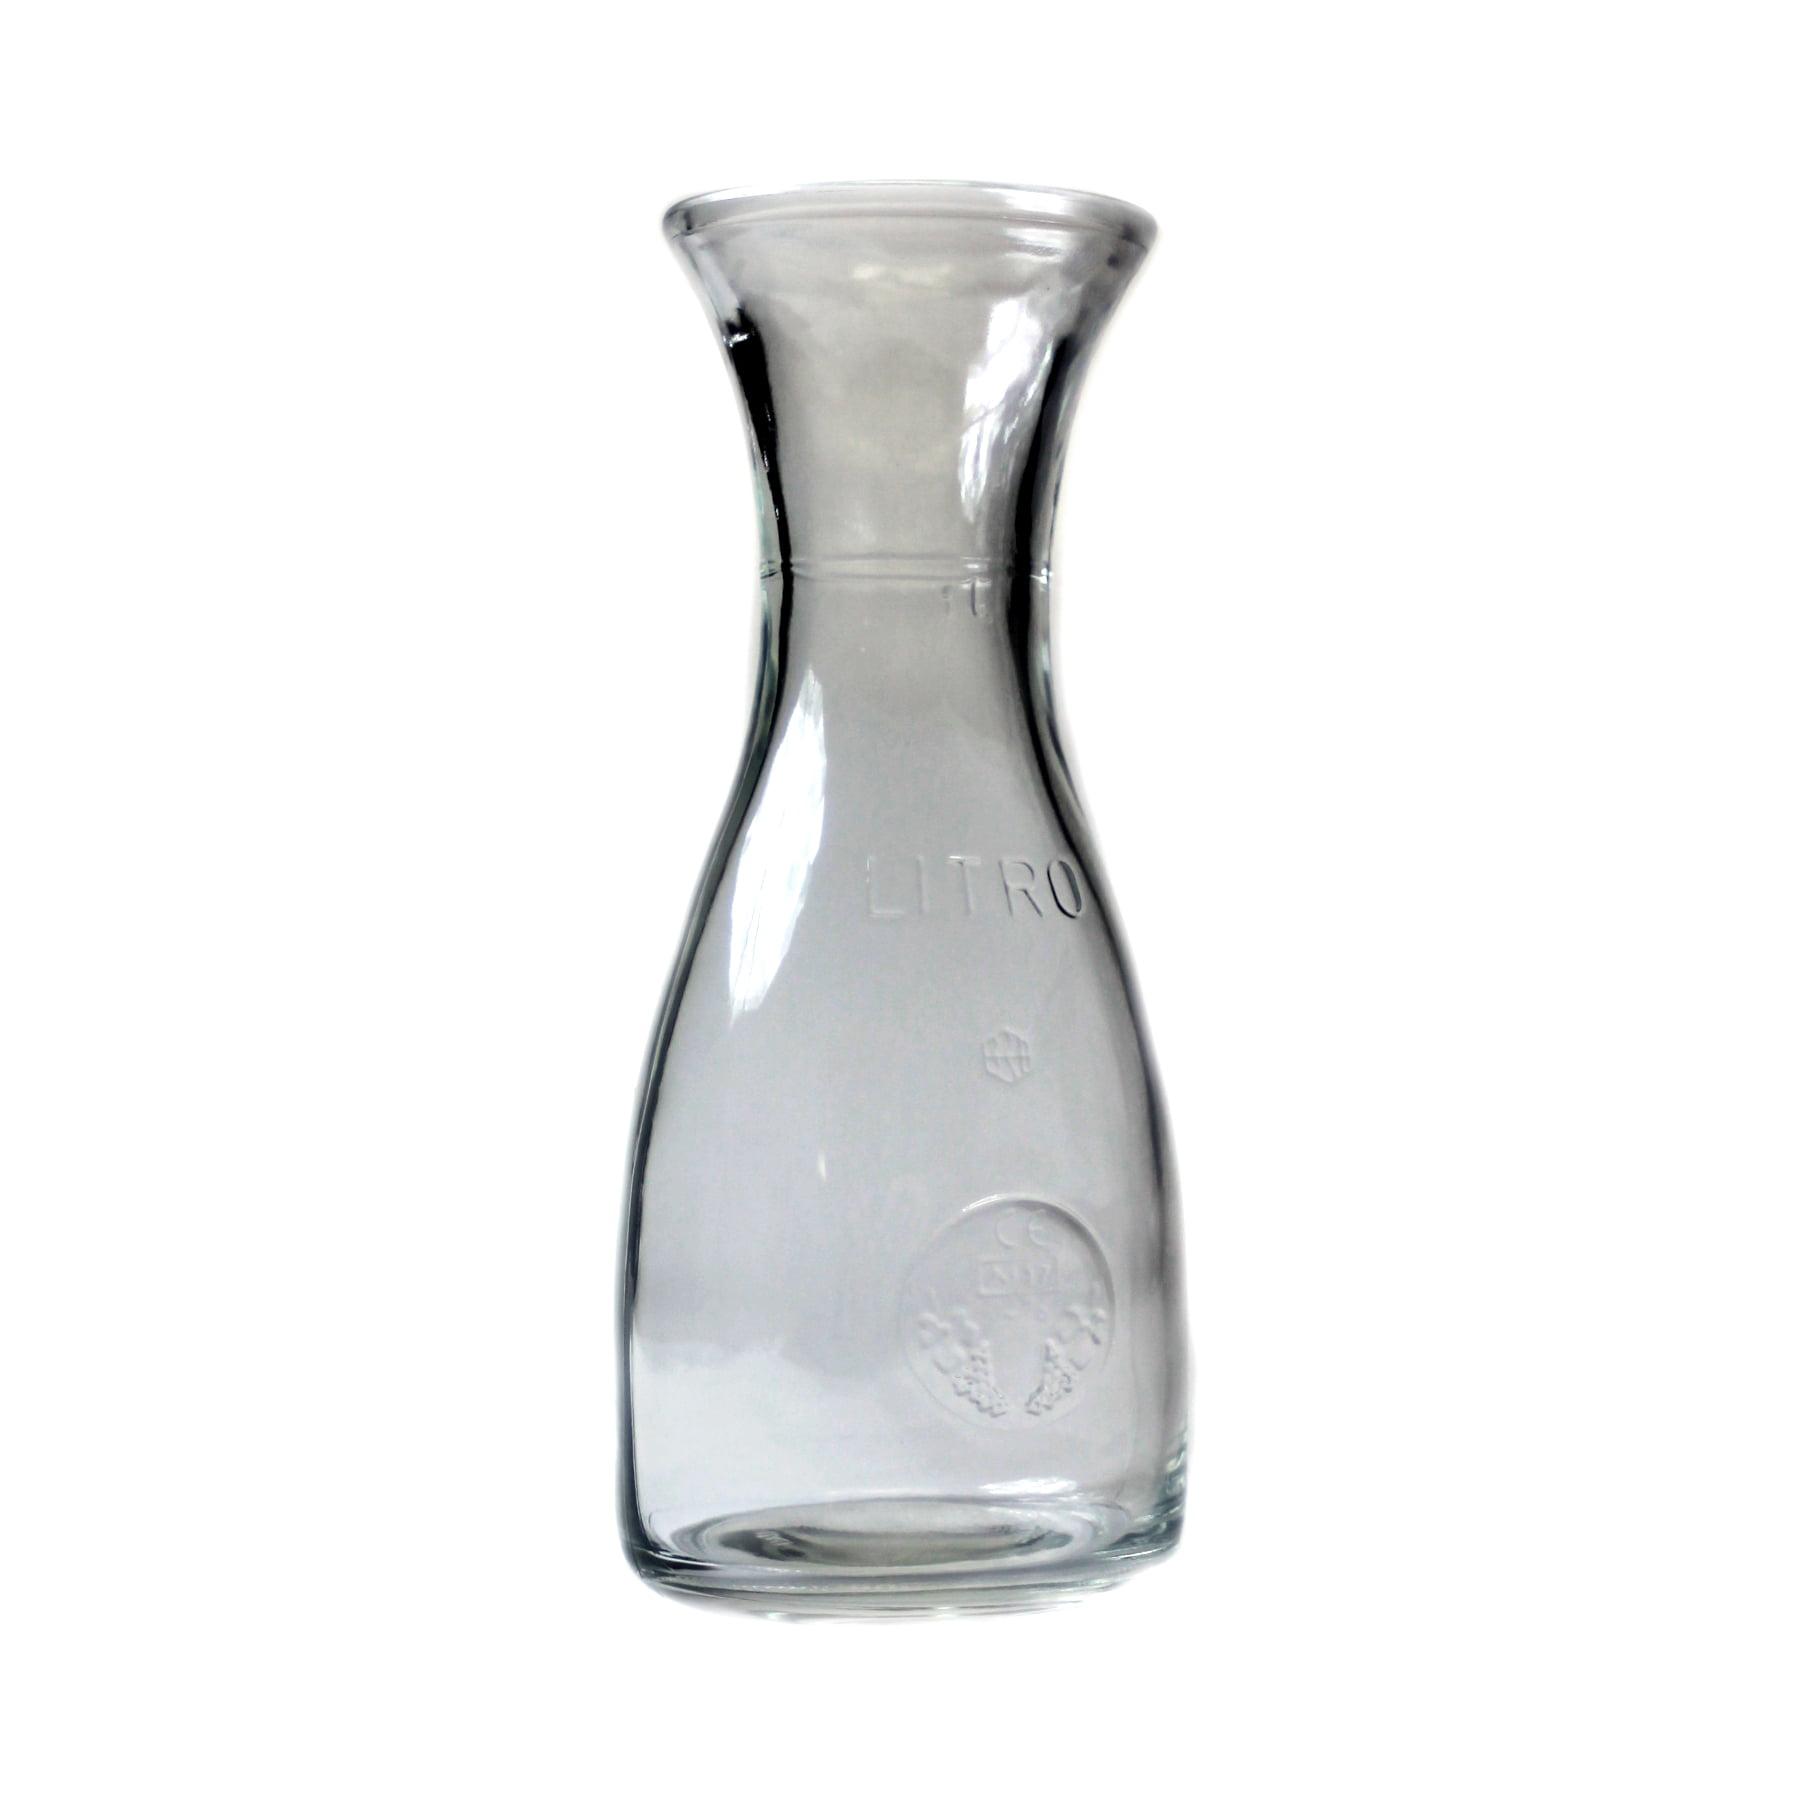 Bormioli Rocco Misura PZ Glass Carafe, 34 Ounce by Bormioli Rocco